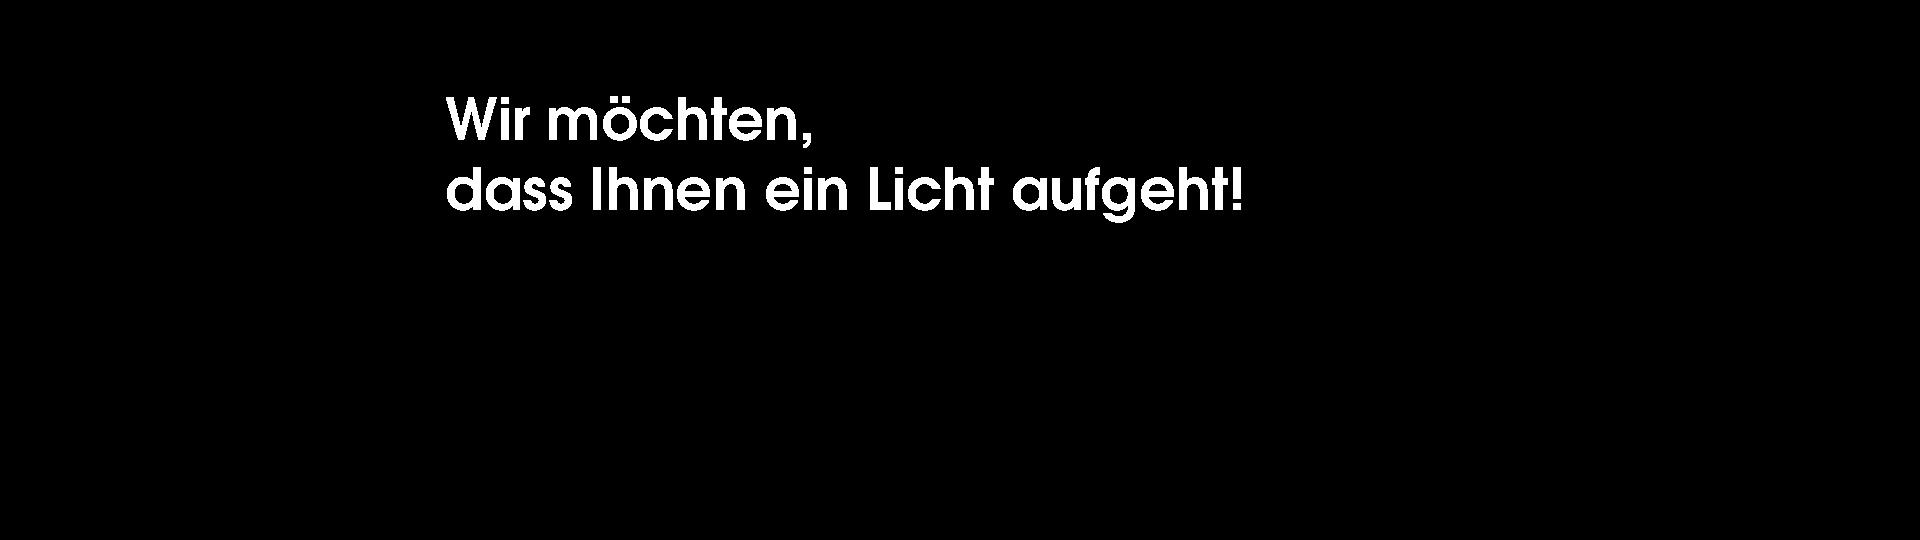 Holzhauer Slide 1 Licht